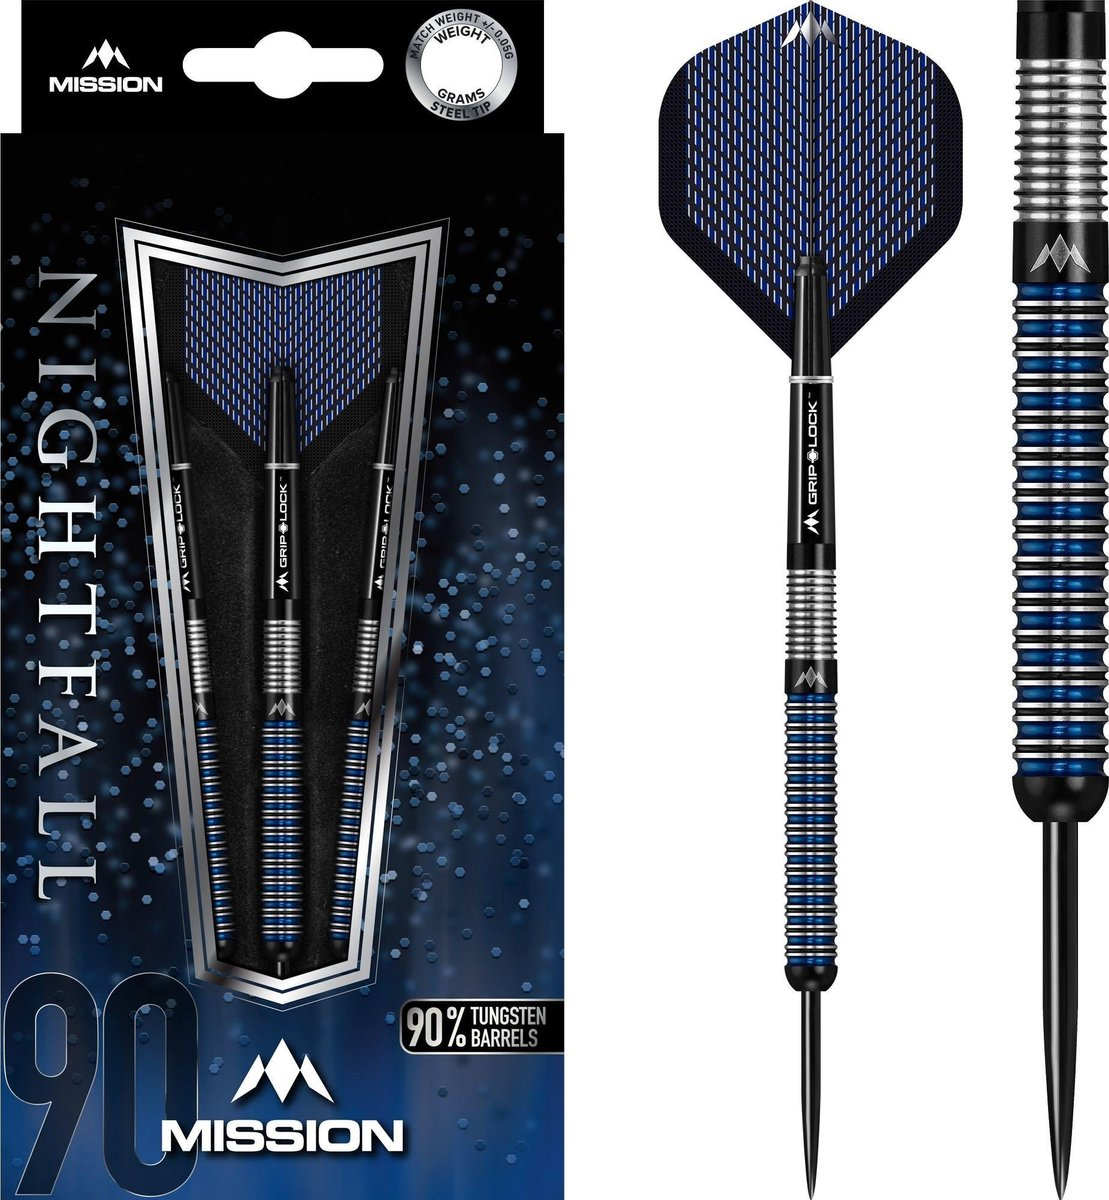 Mission Nightfall M1 90% - 21 Gram